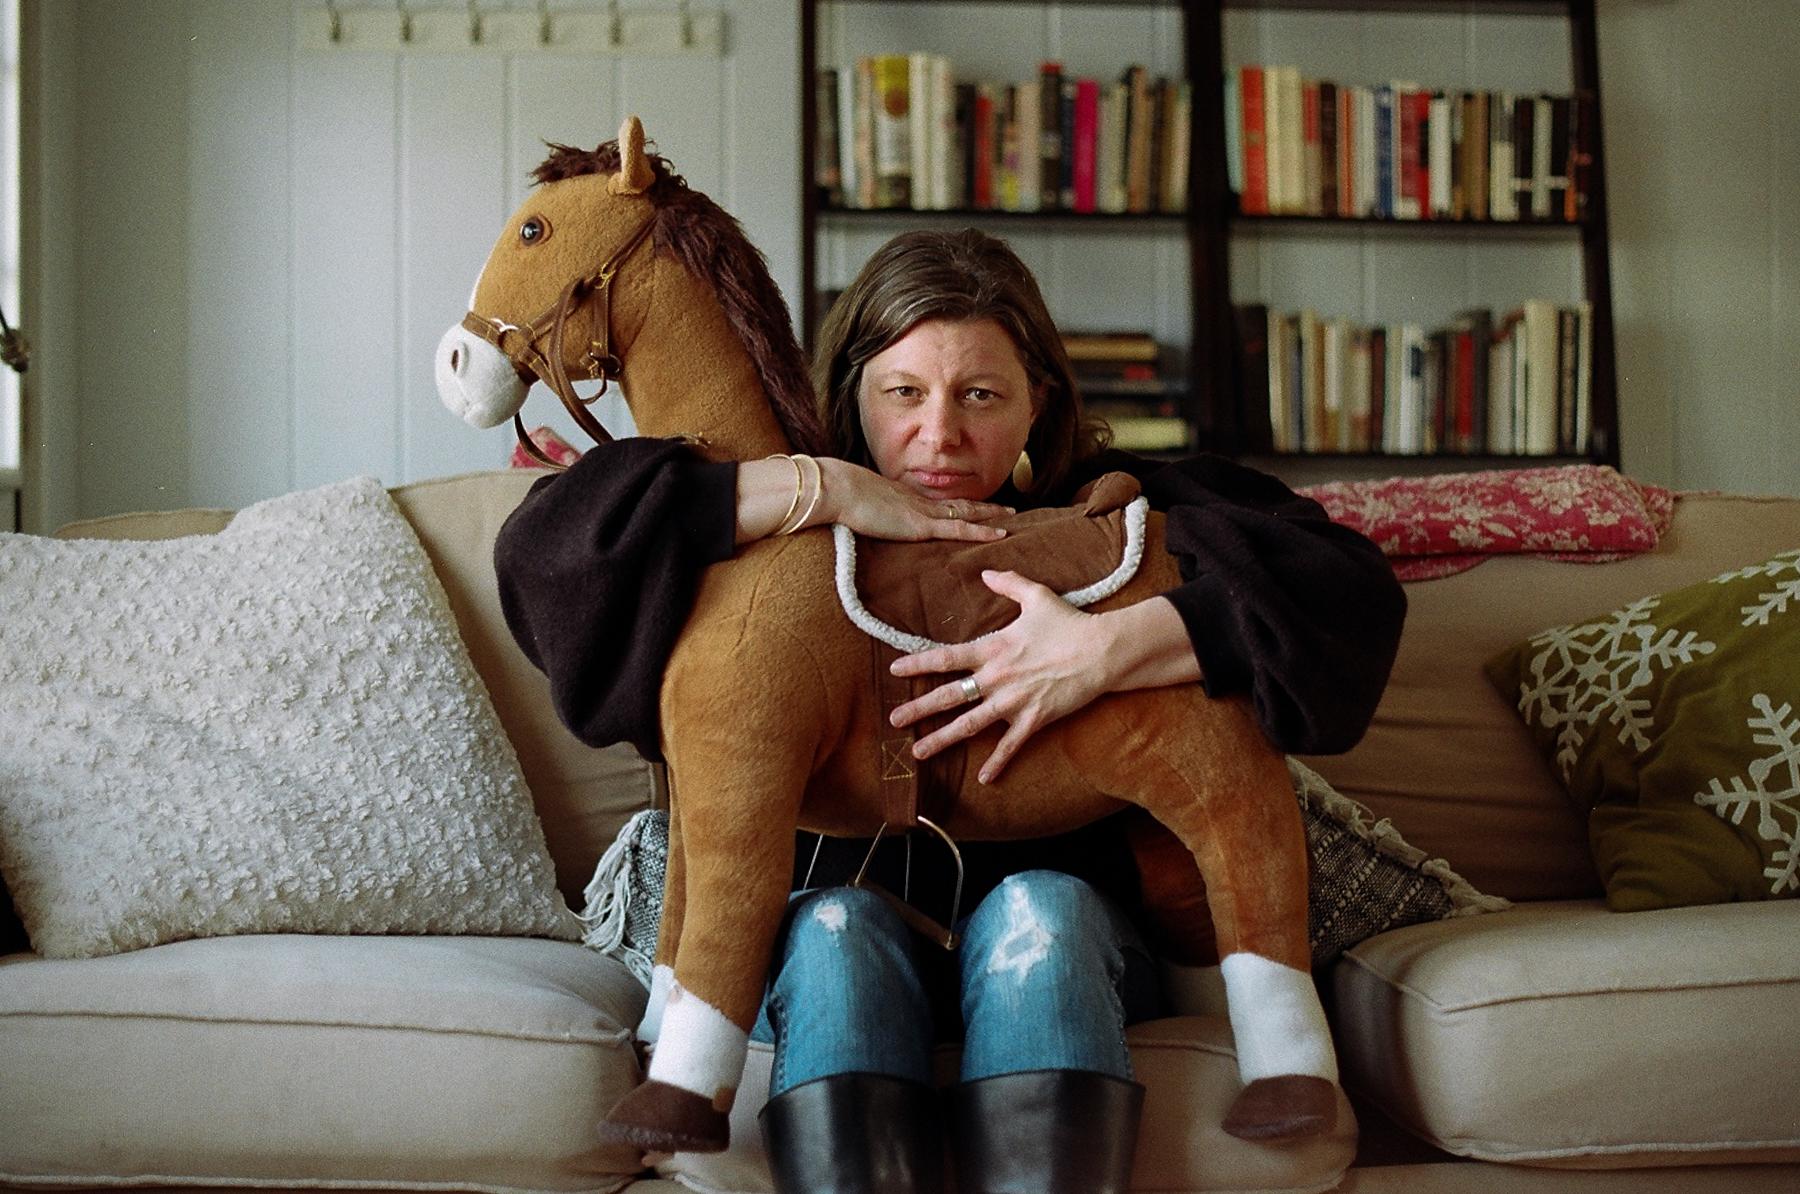 Jillian + her daughter's horse